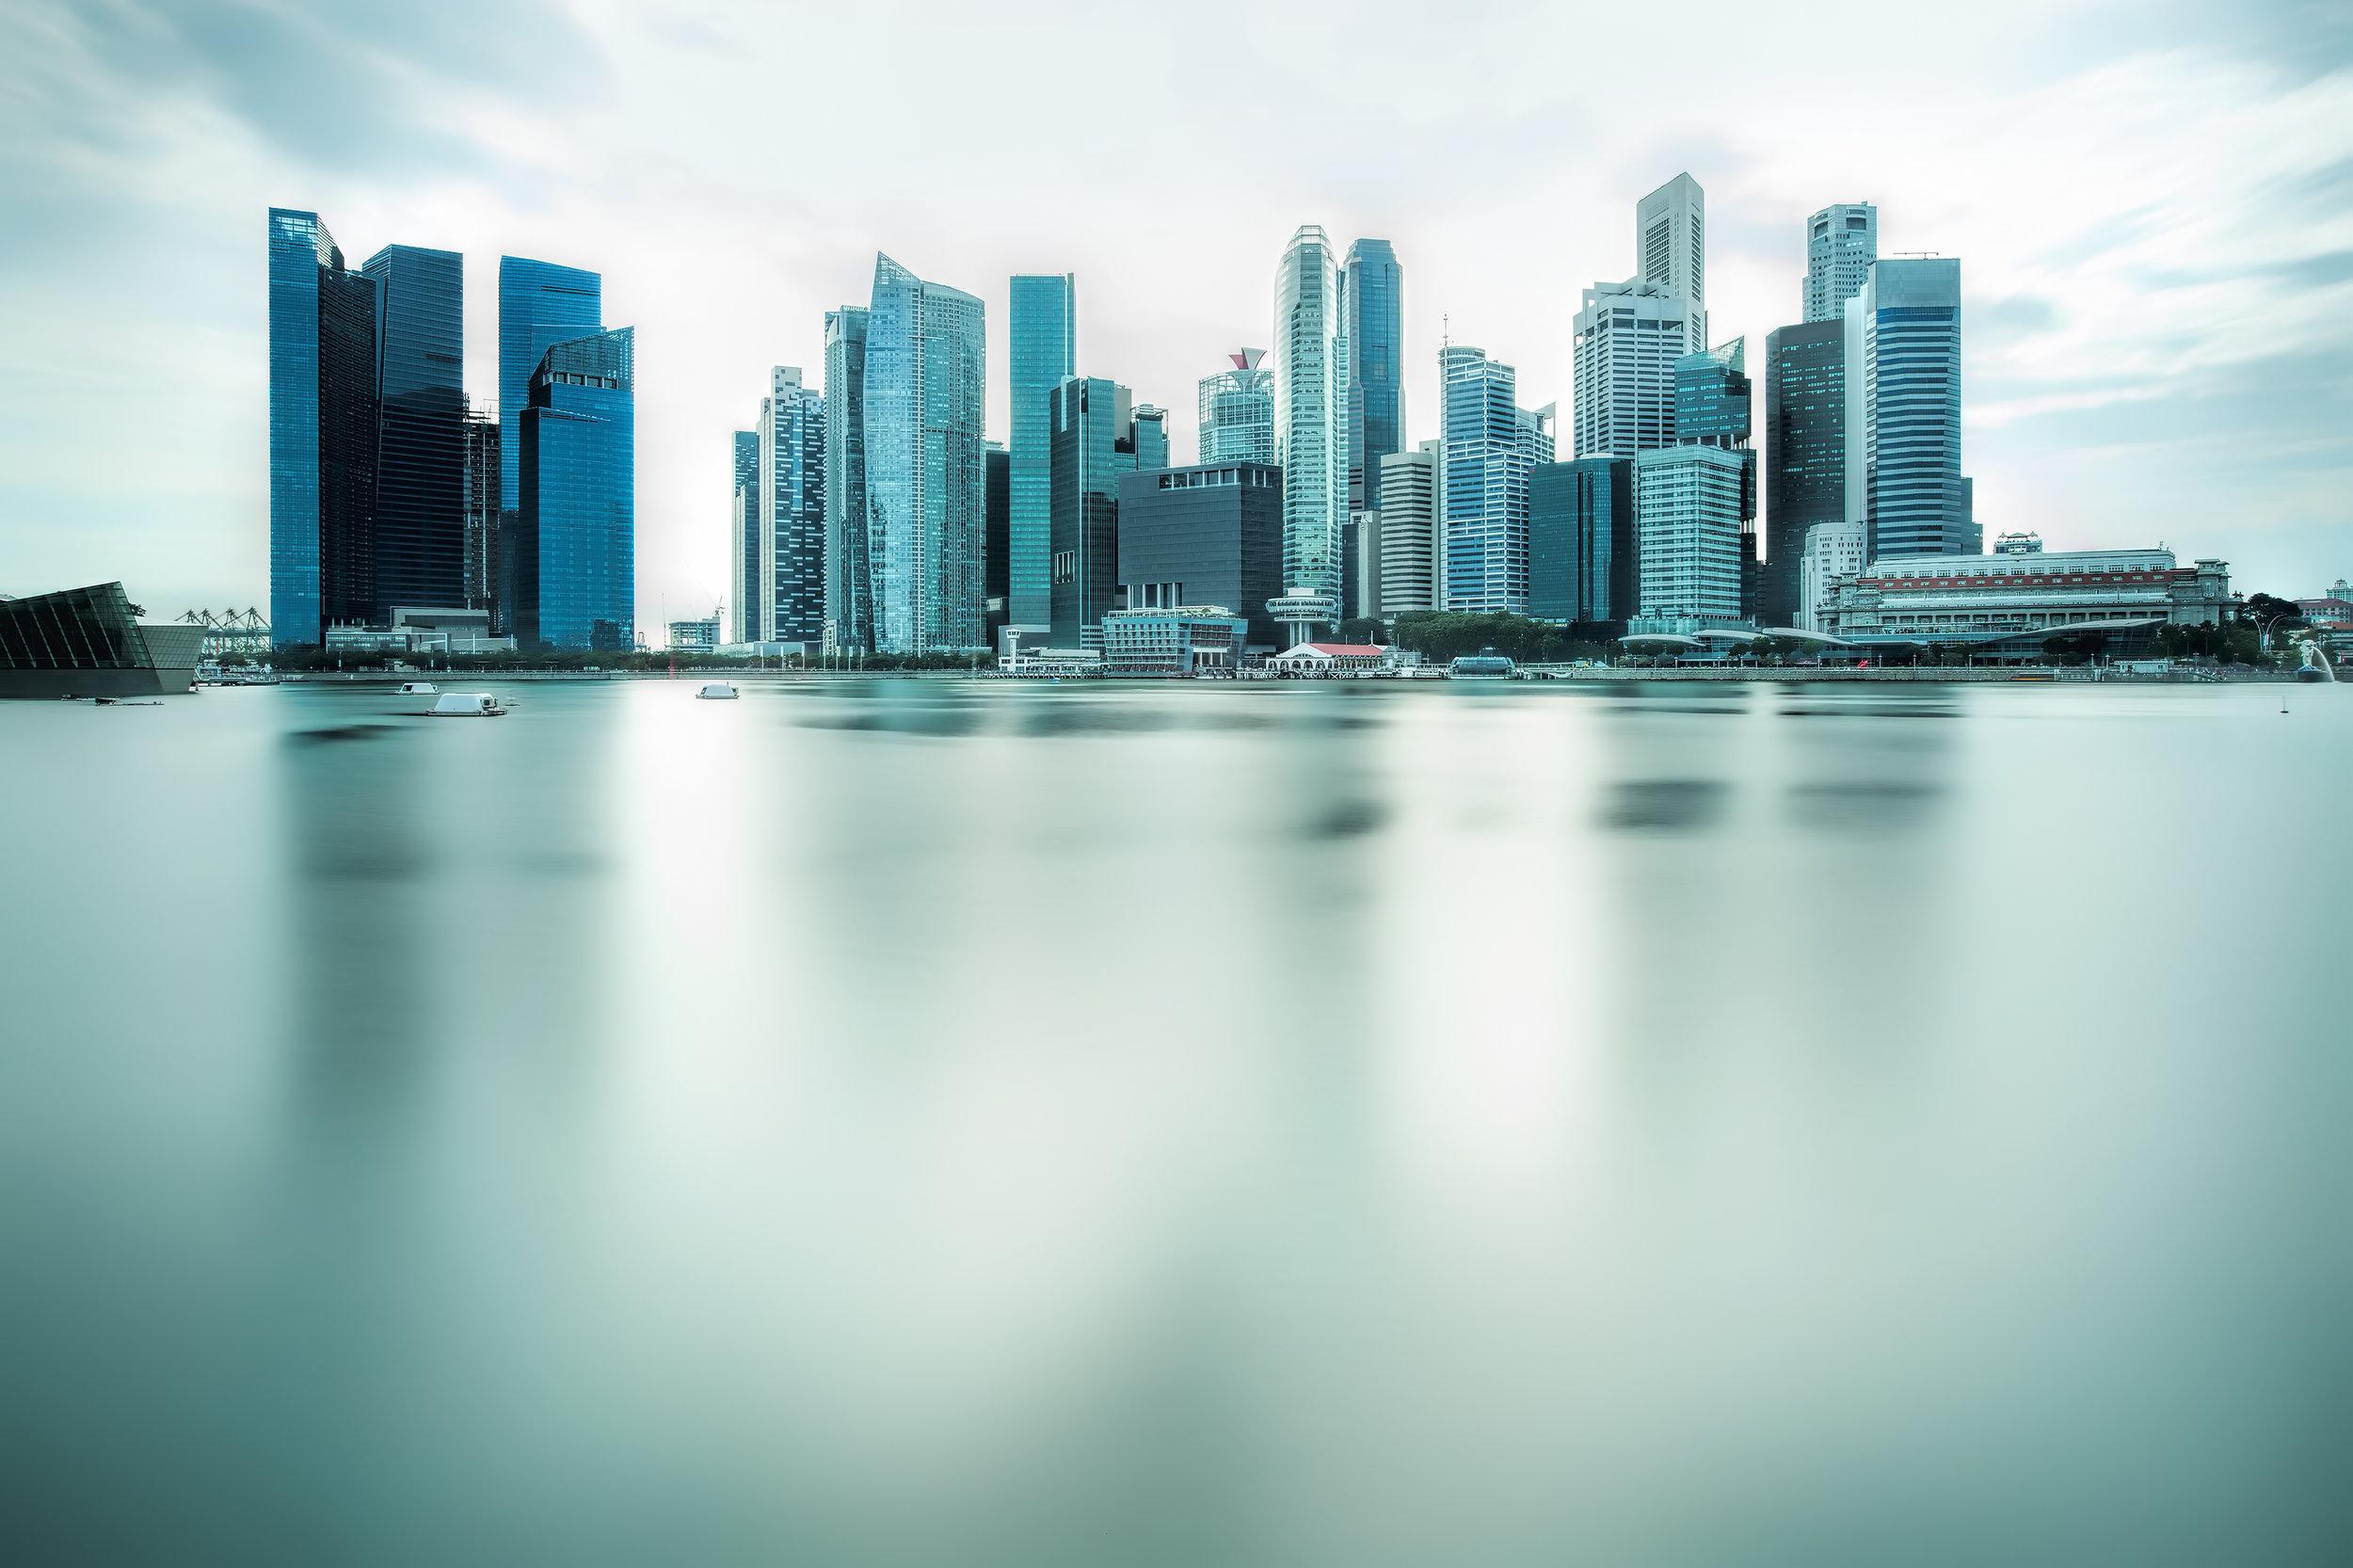 CSLB-Asia-Singapore-skyline-image